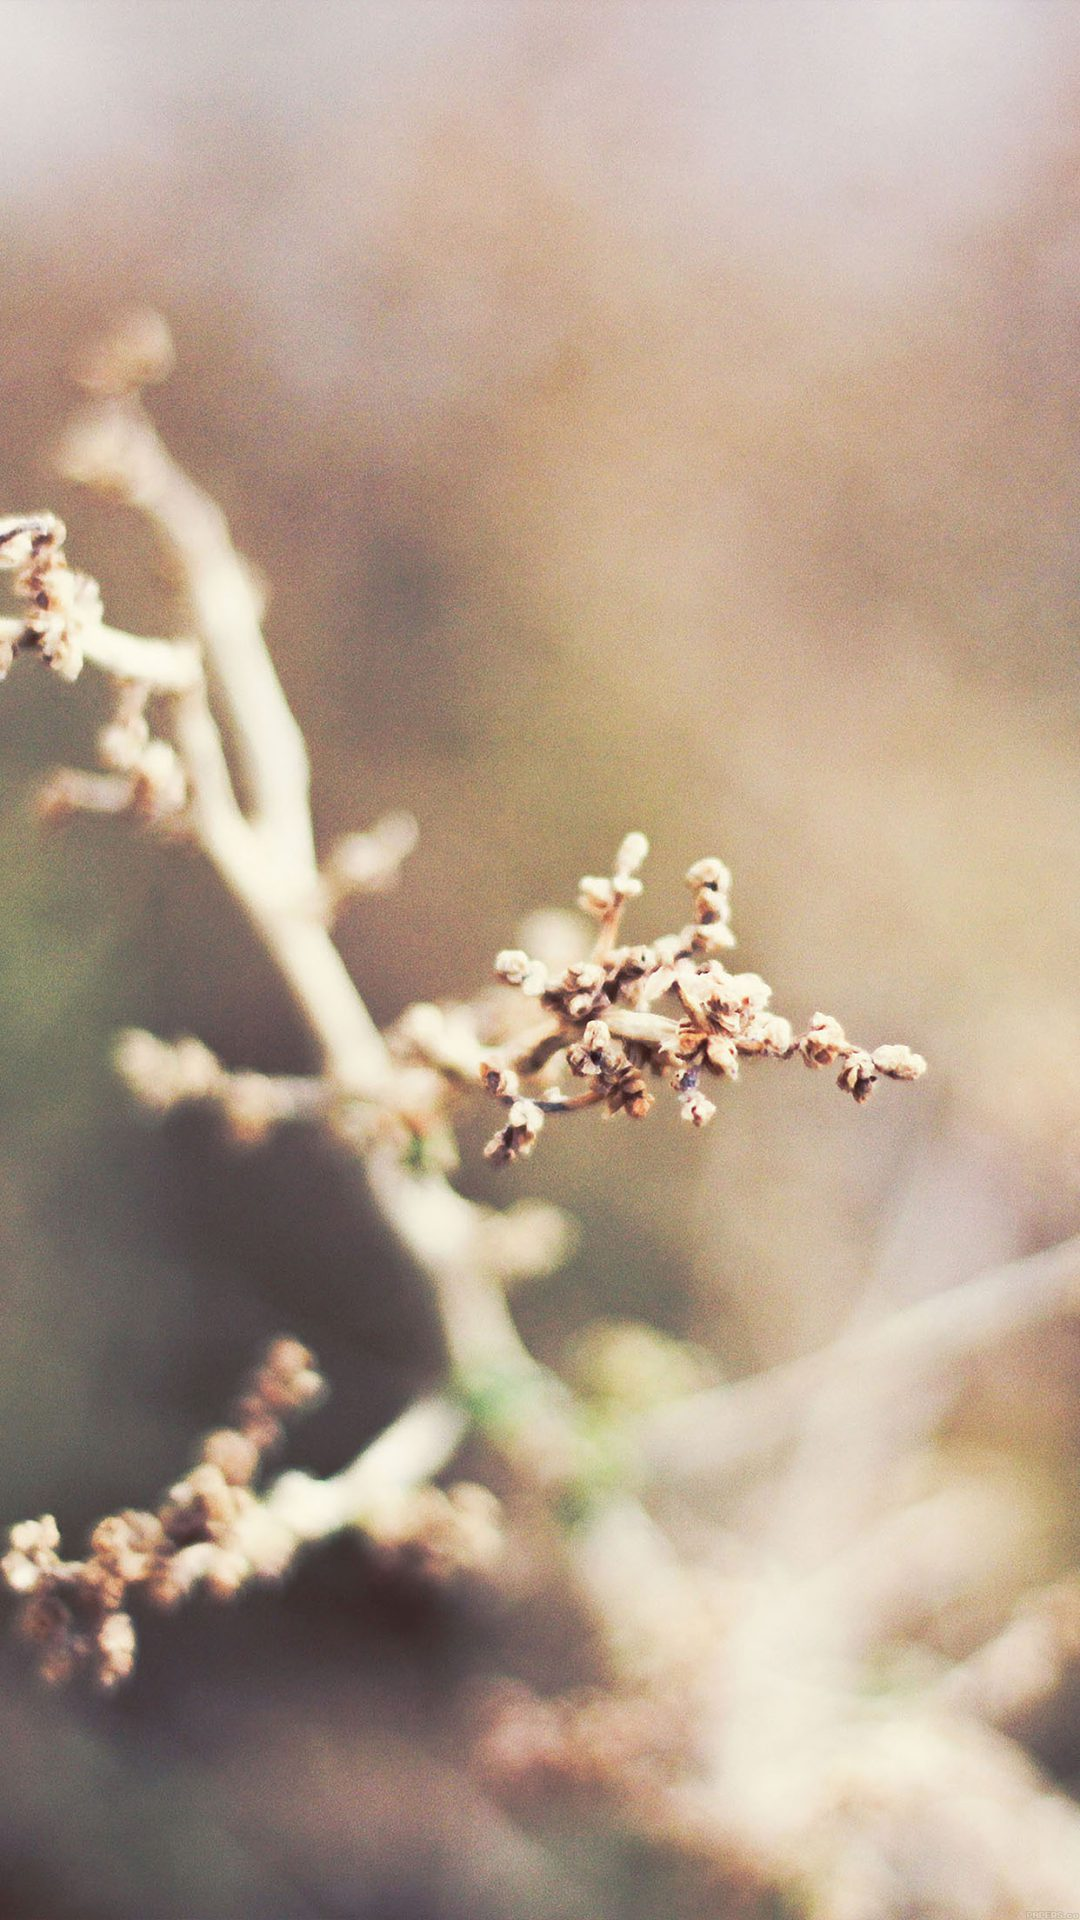 Blossom Flower Nature